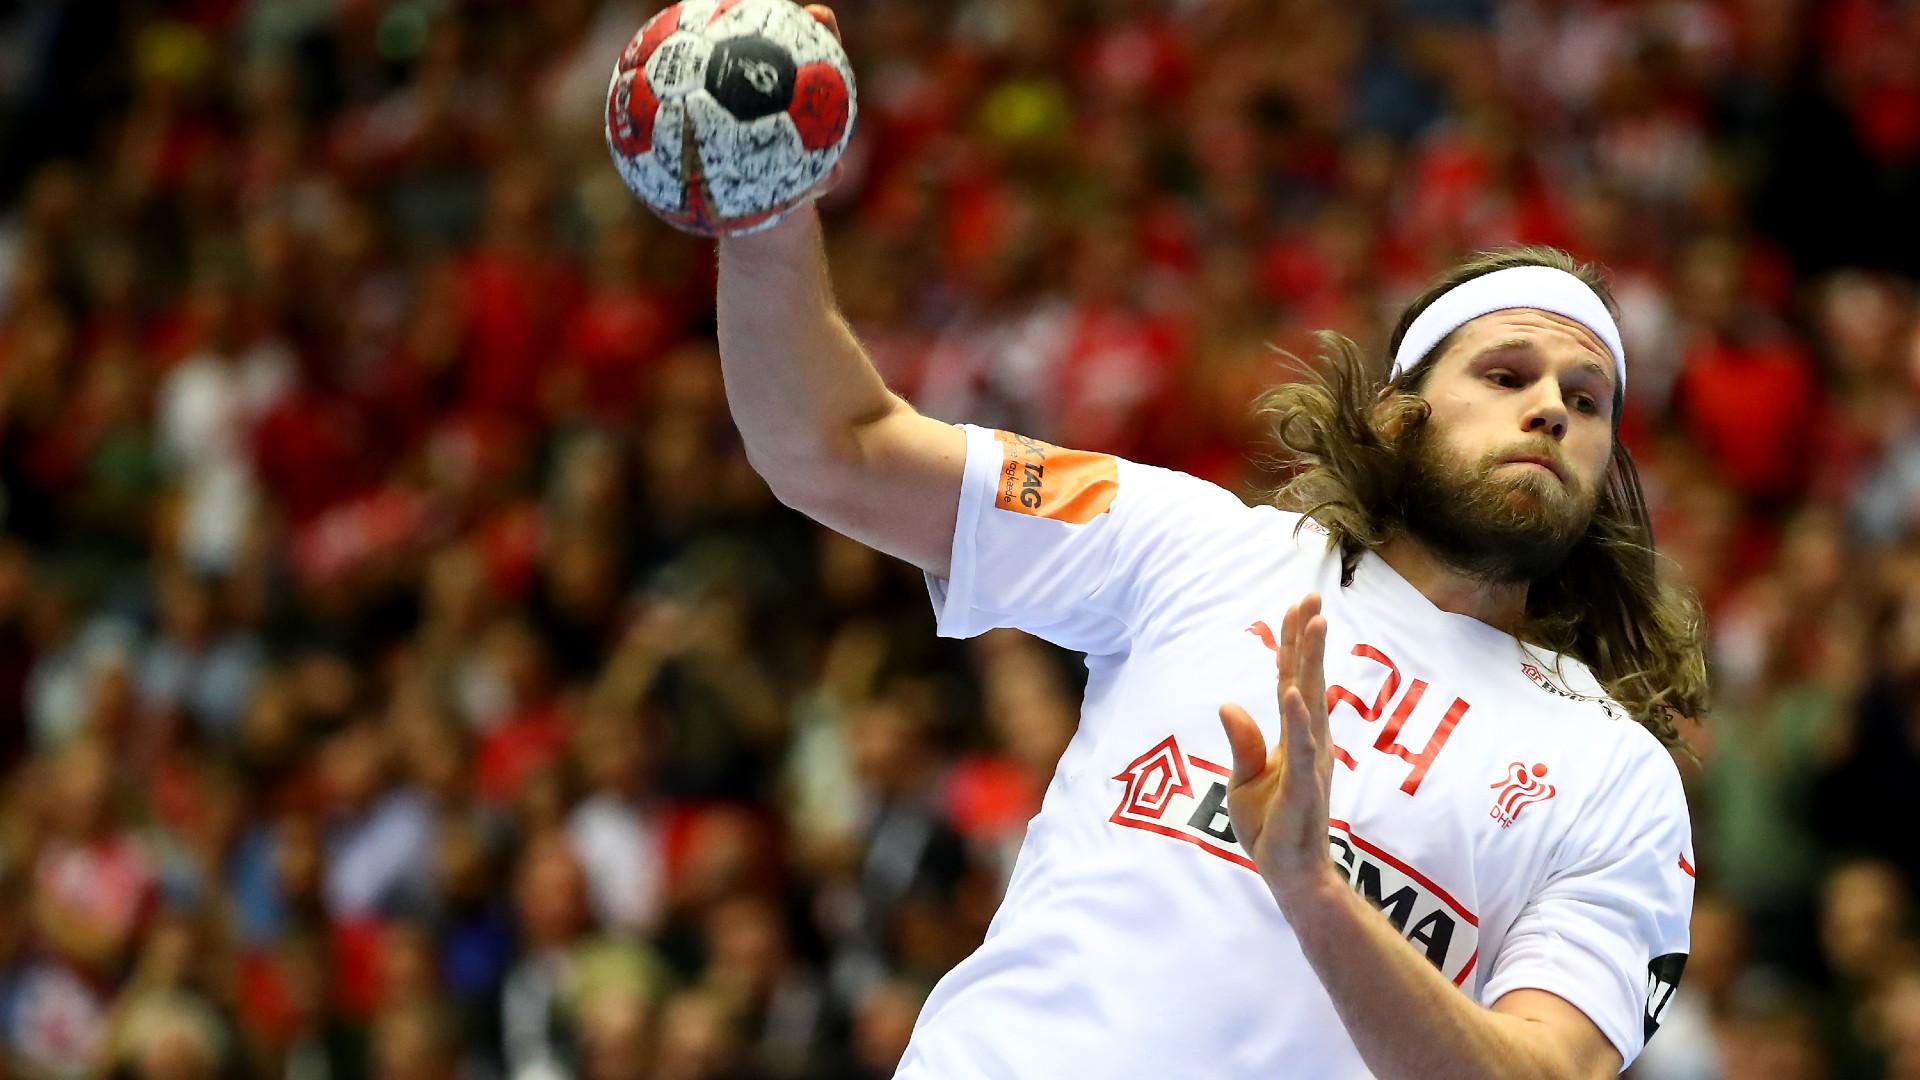 Handball Wm 2021 Live Tv